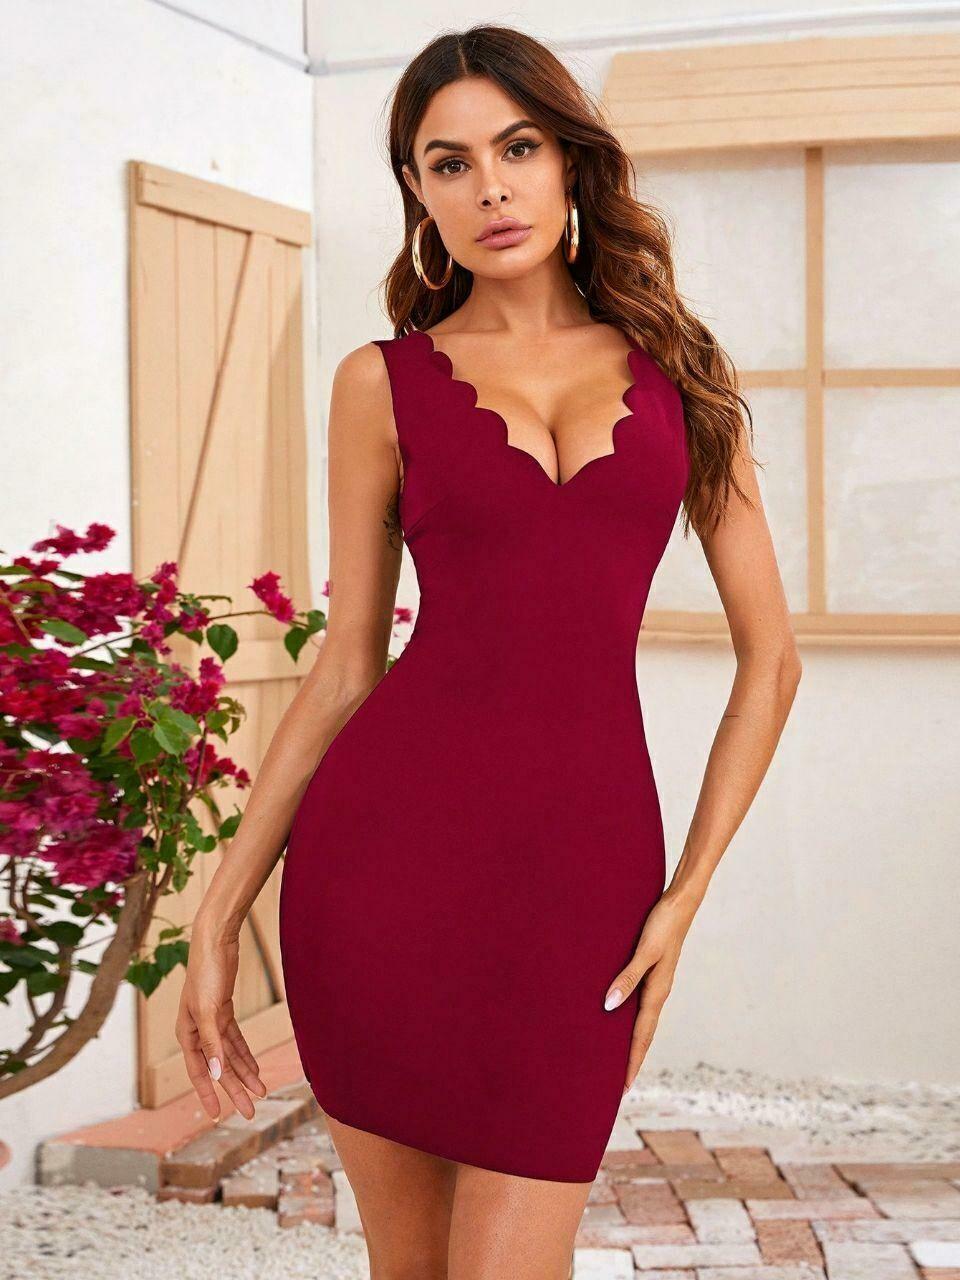 Small Red color dress ቀይ አጭር ቀሚስ